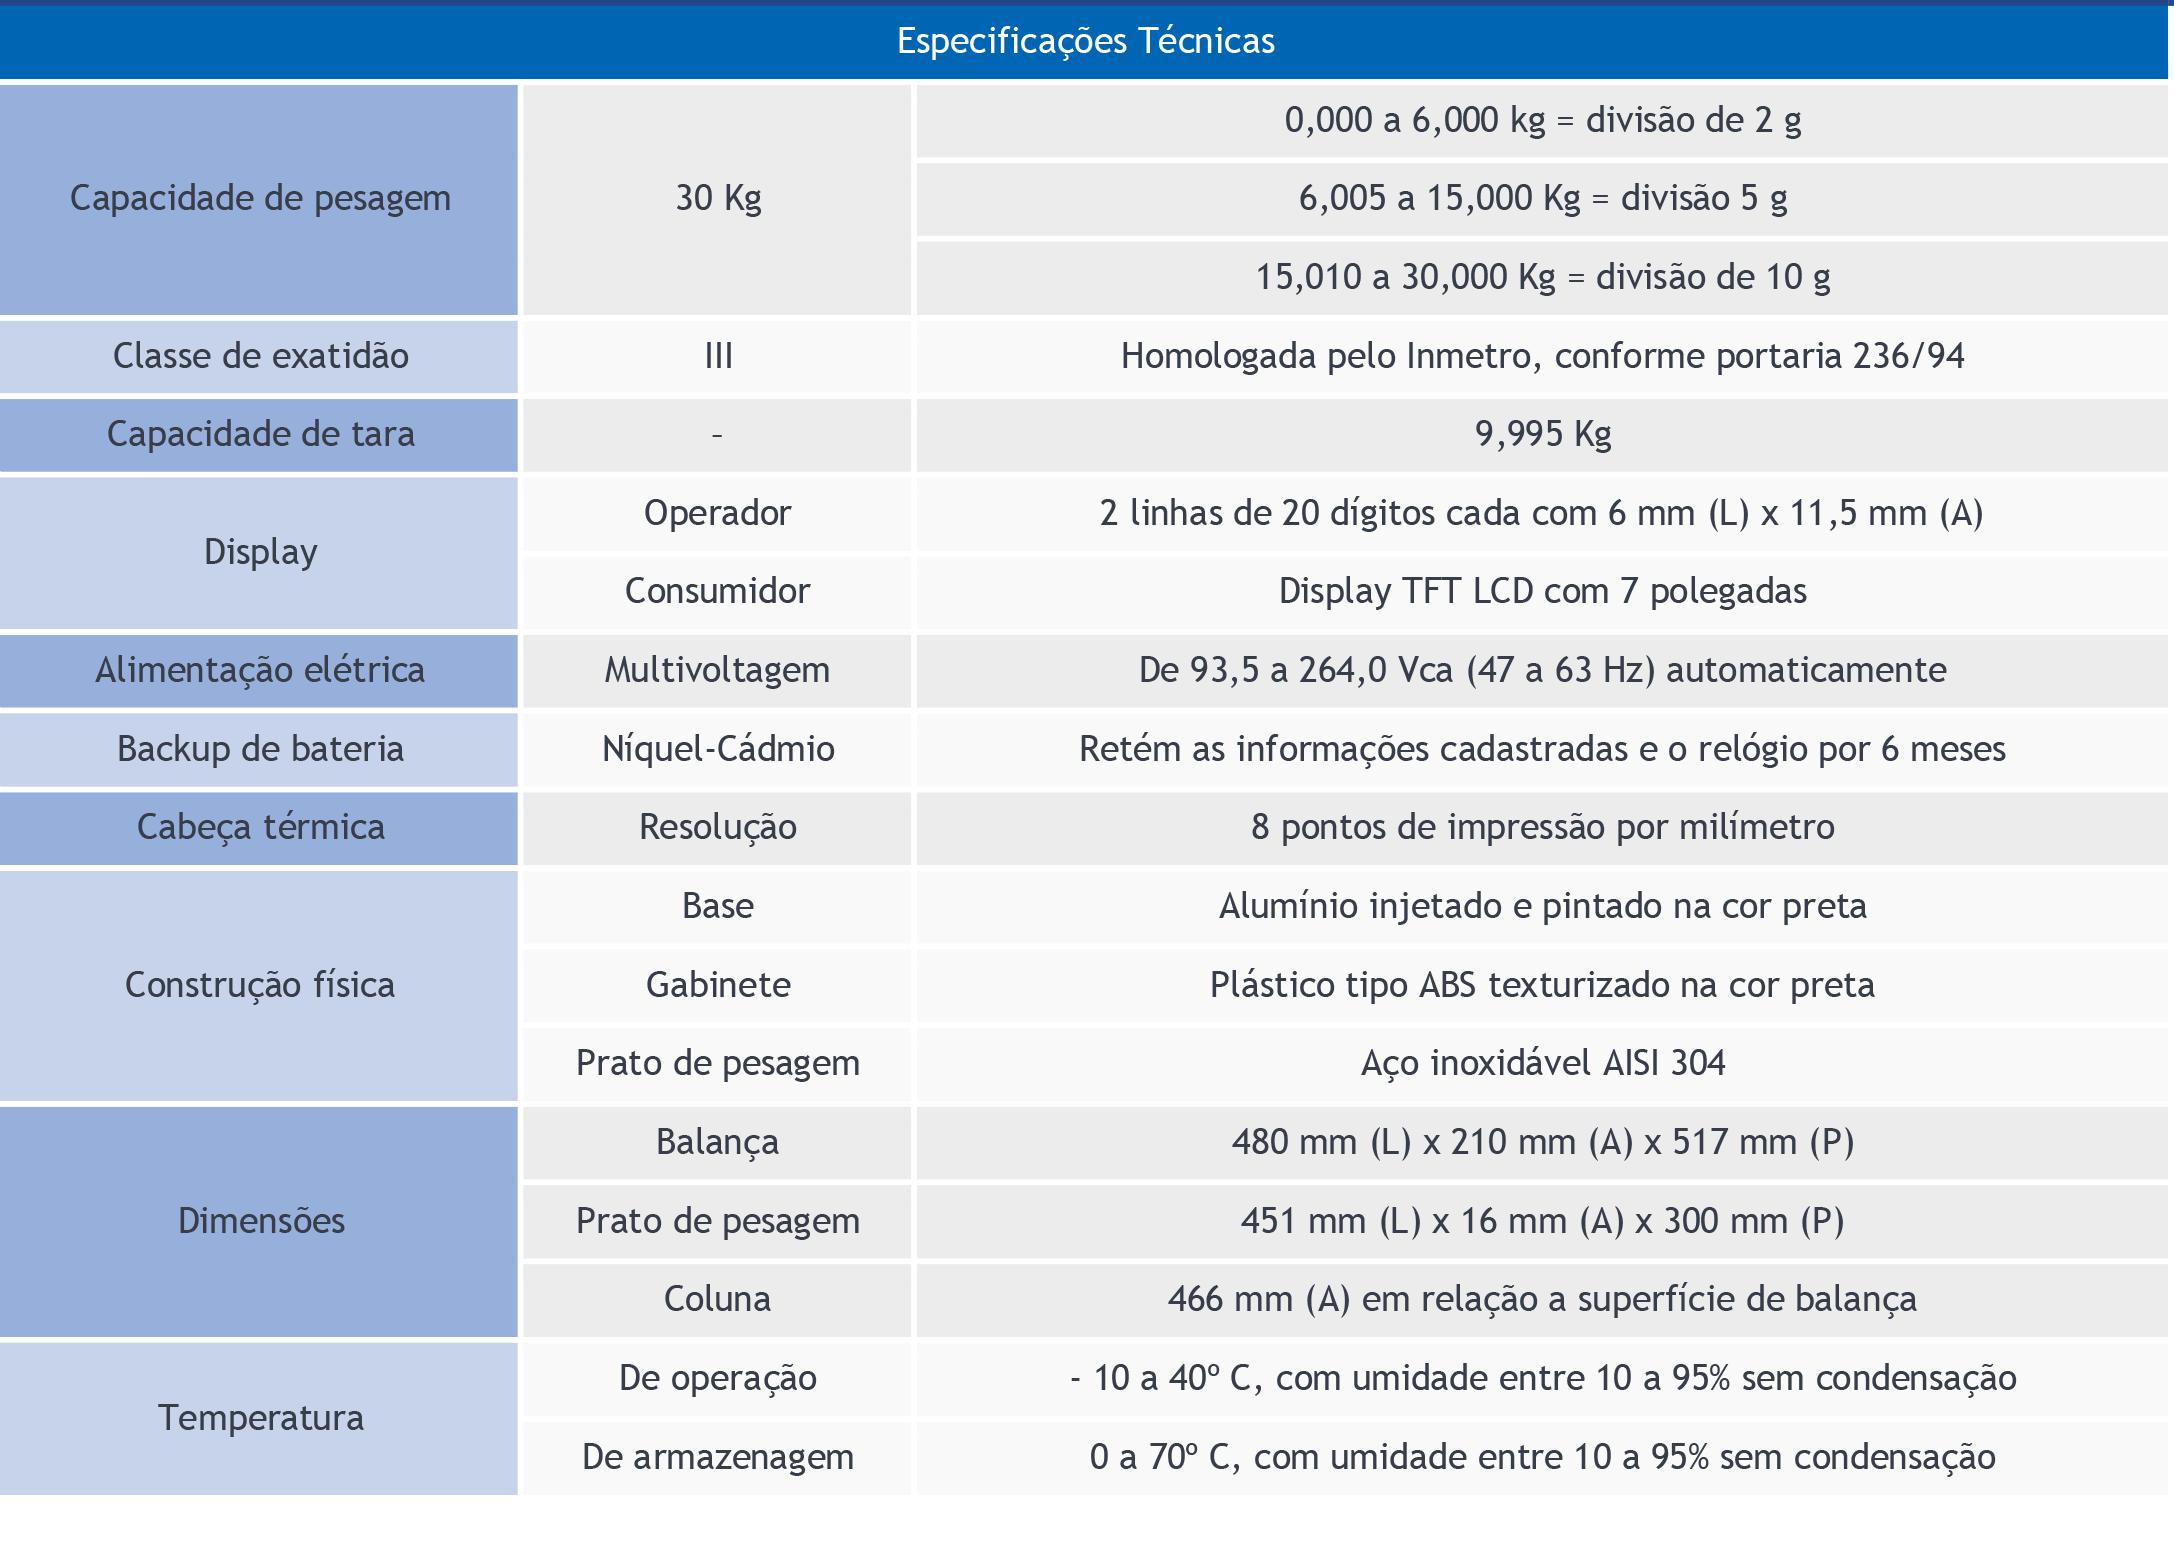 Prix-6_especificacoes